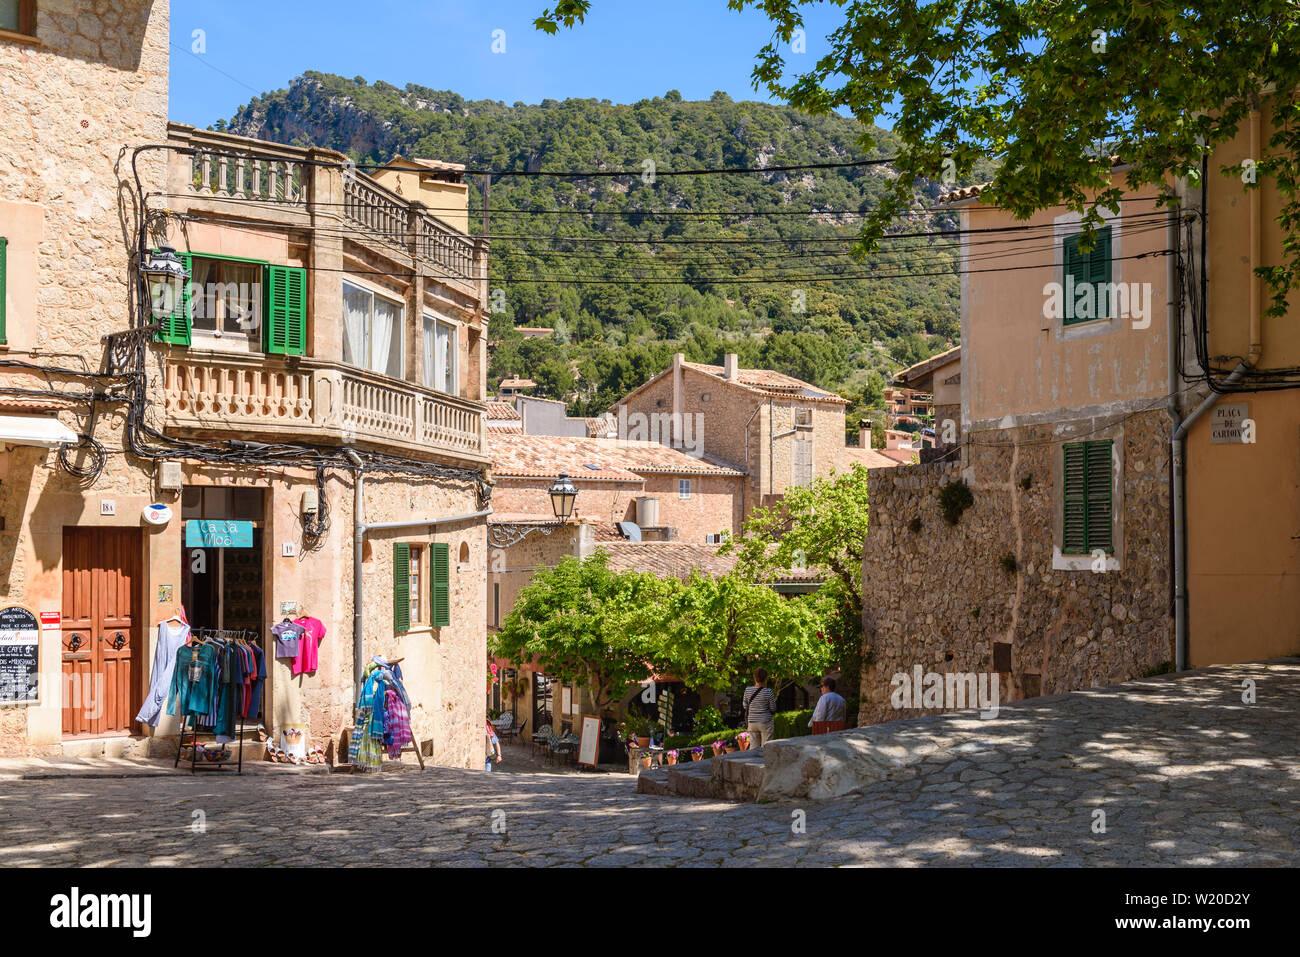 Valldemossa, Mallorca, Spain - May 7, 2019: Street in the centre of Valldemossa old town. Europe Stock Photo